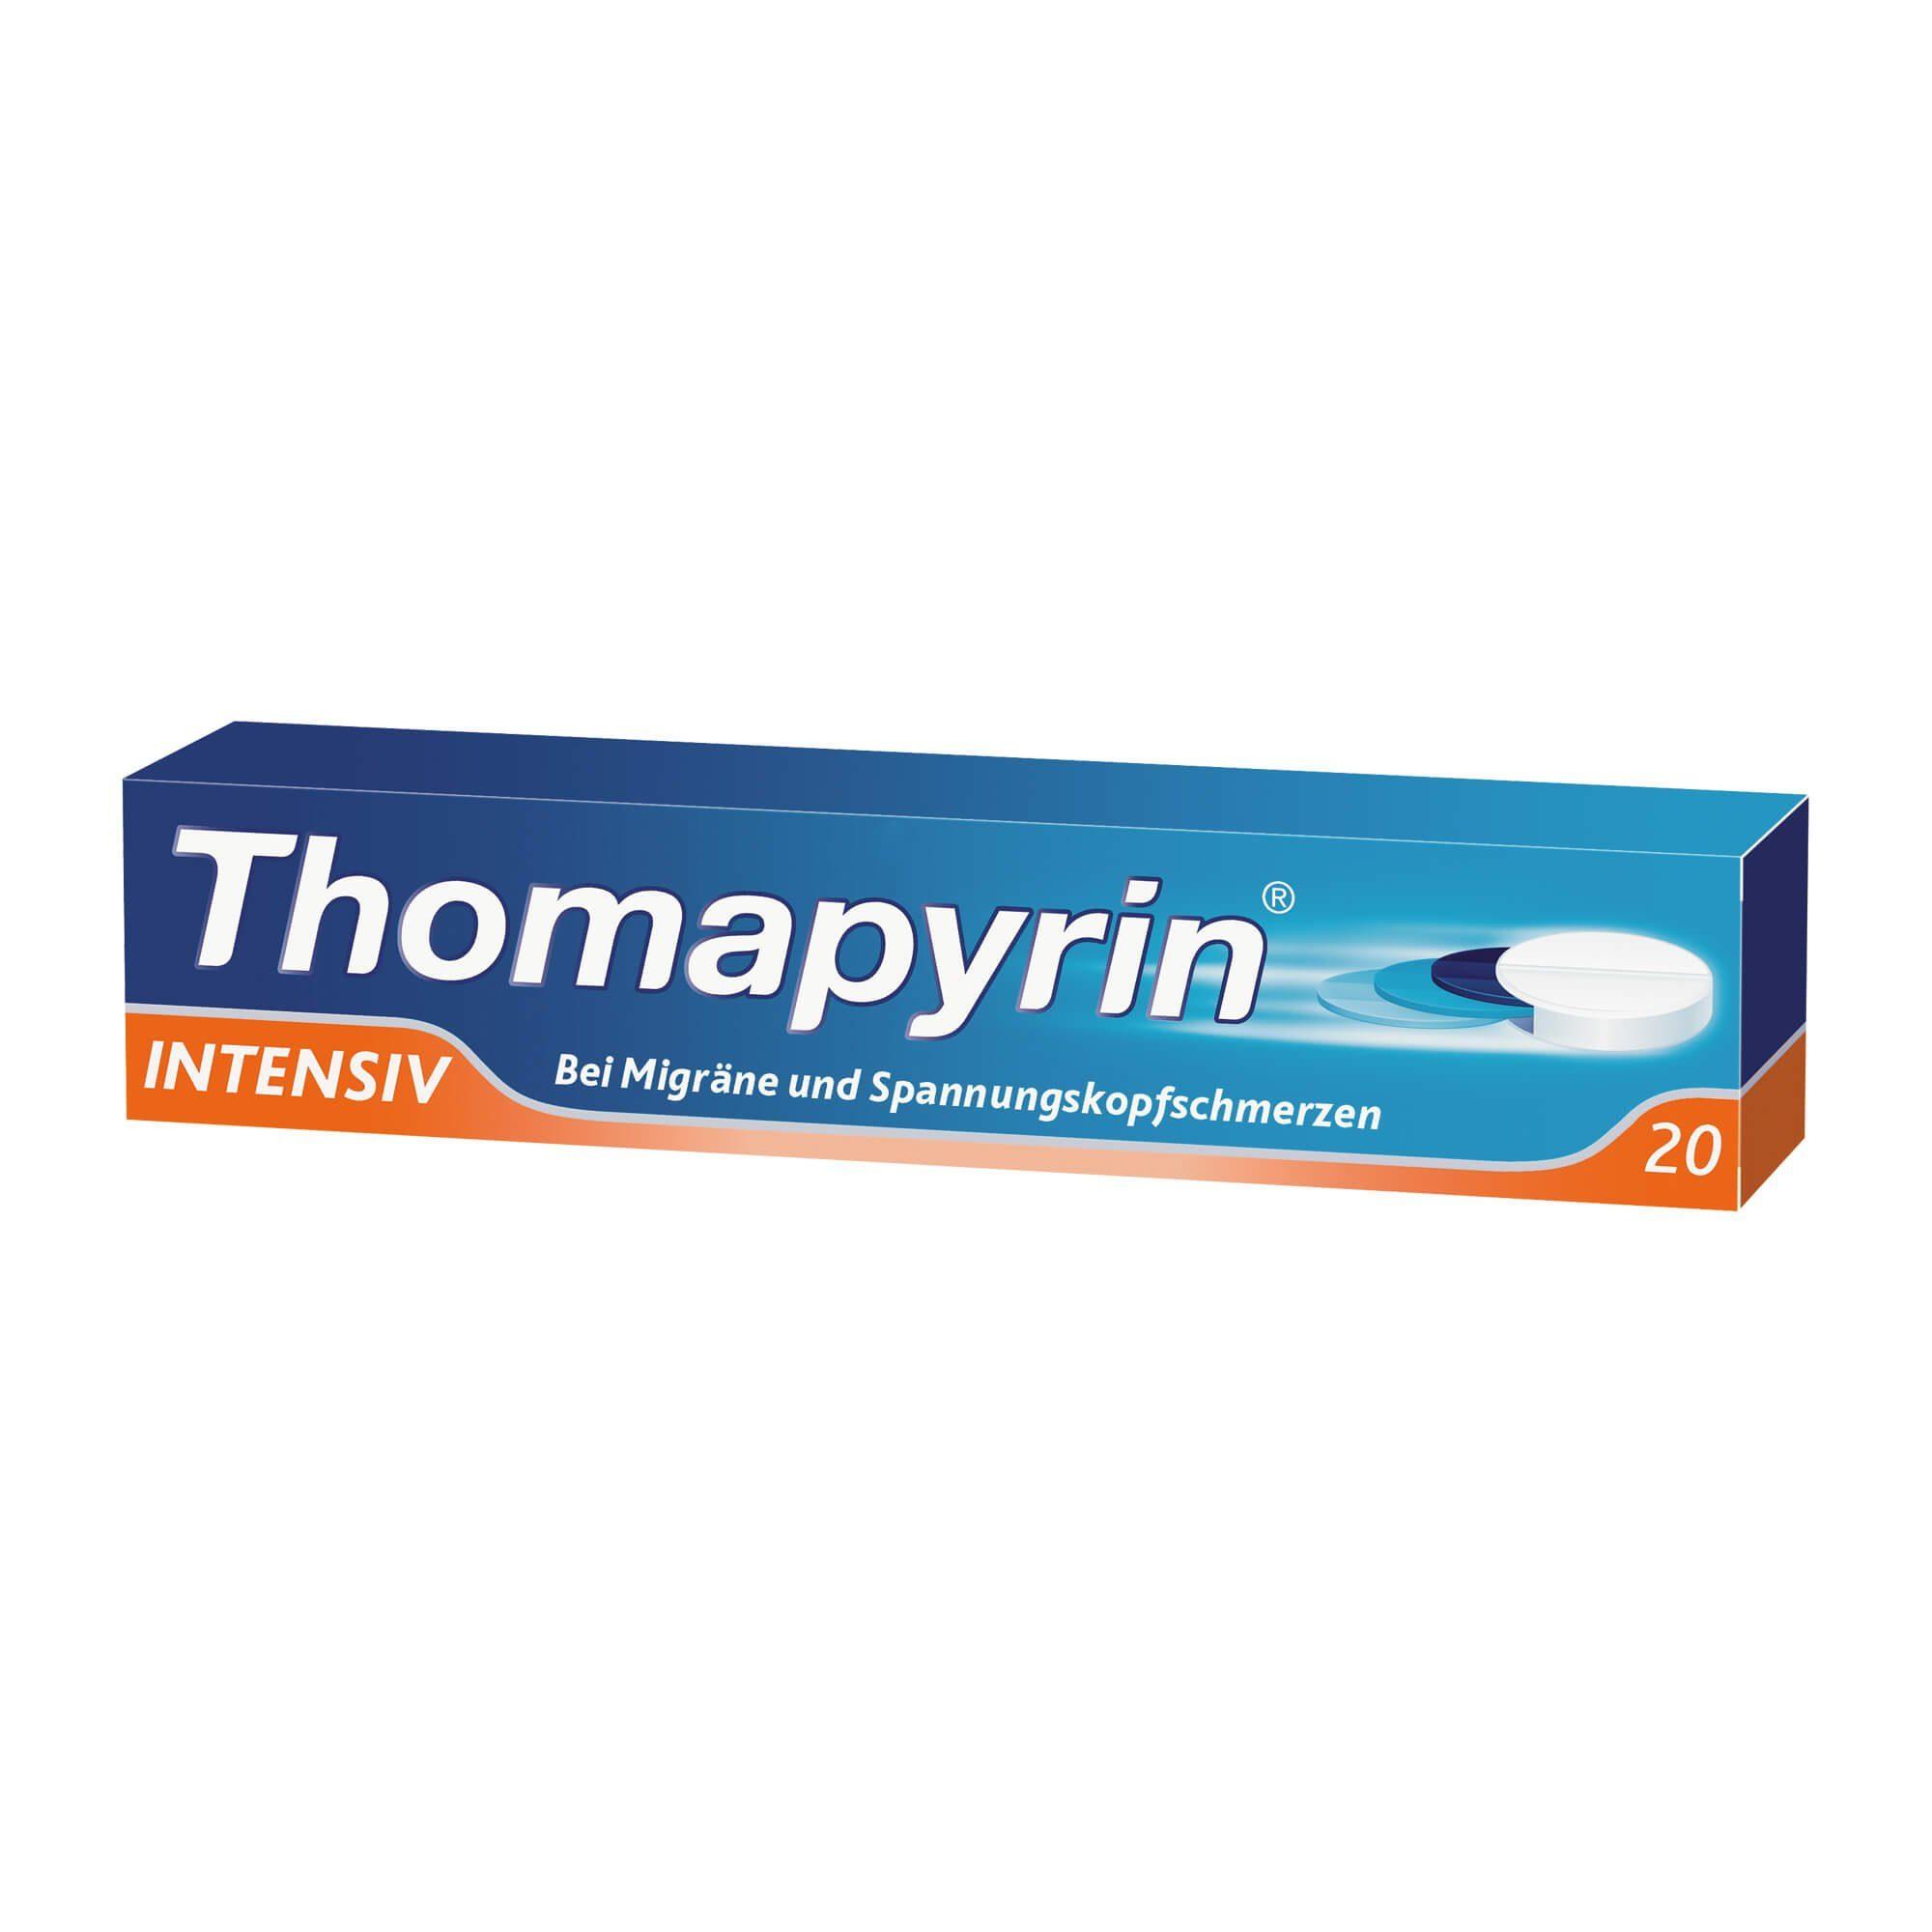 Thomapyrin intensiv Tabletten, 20 St